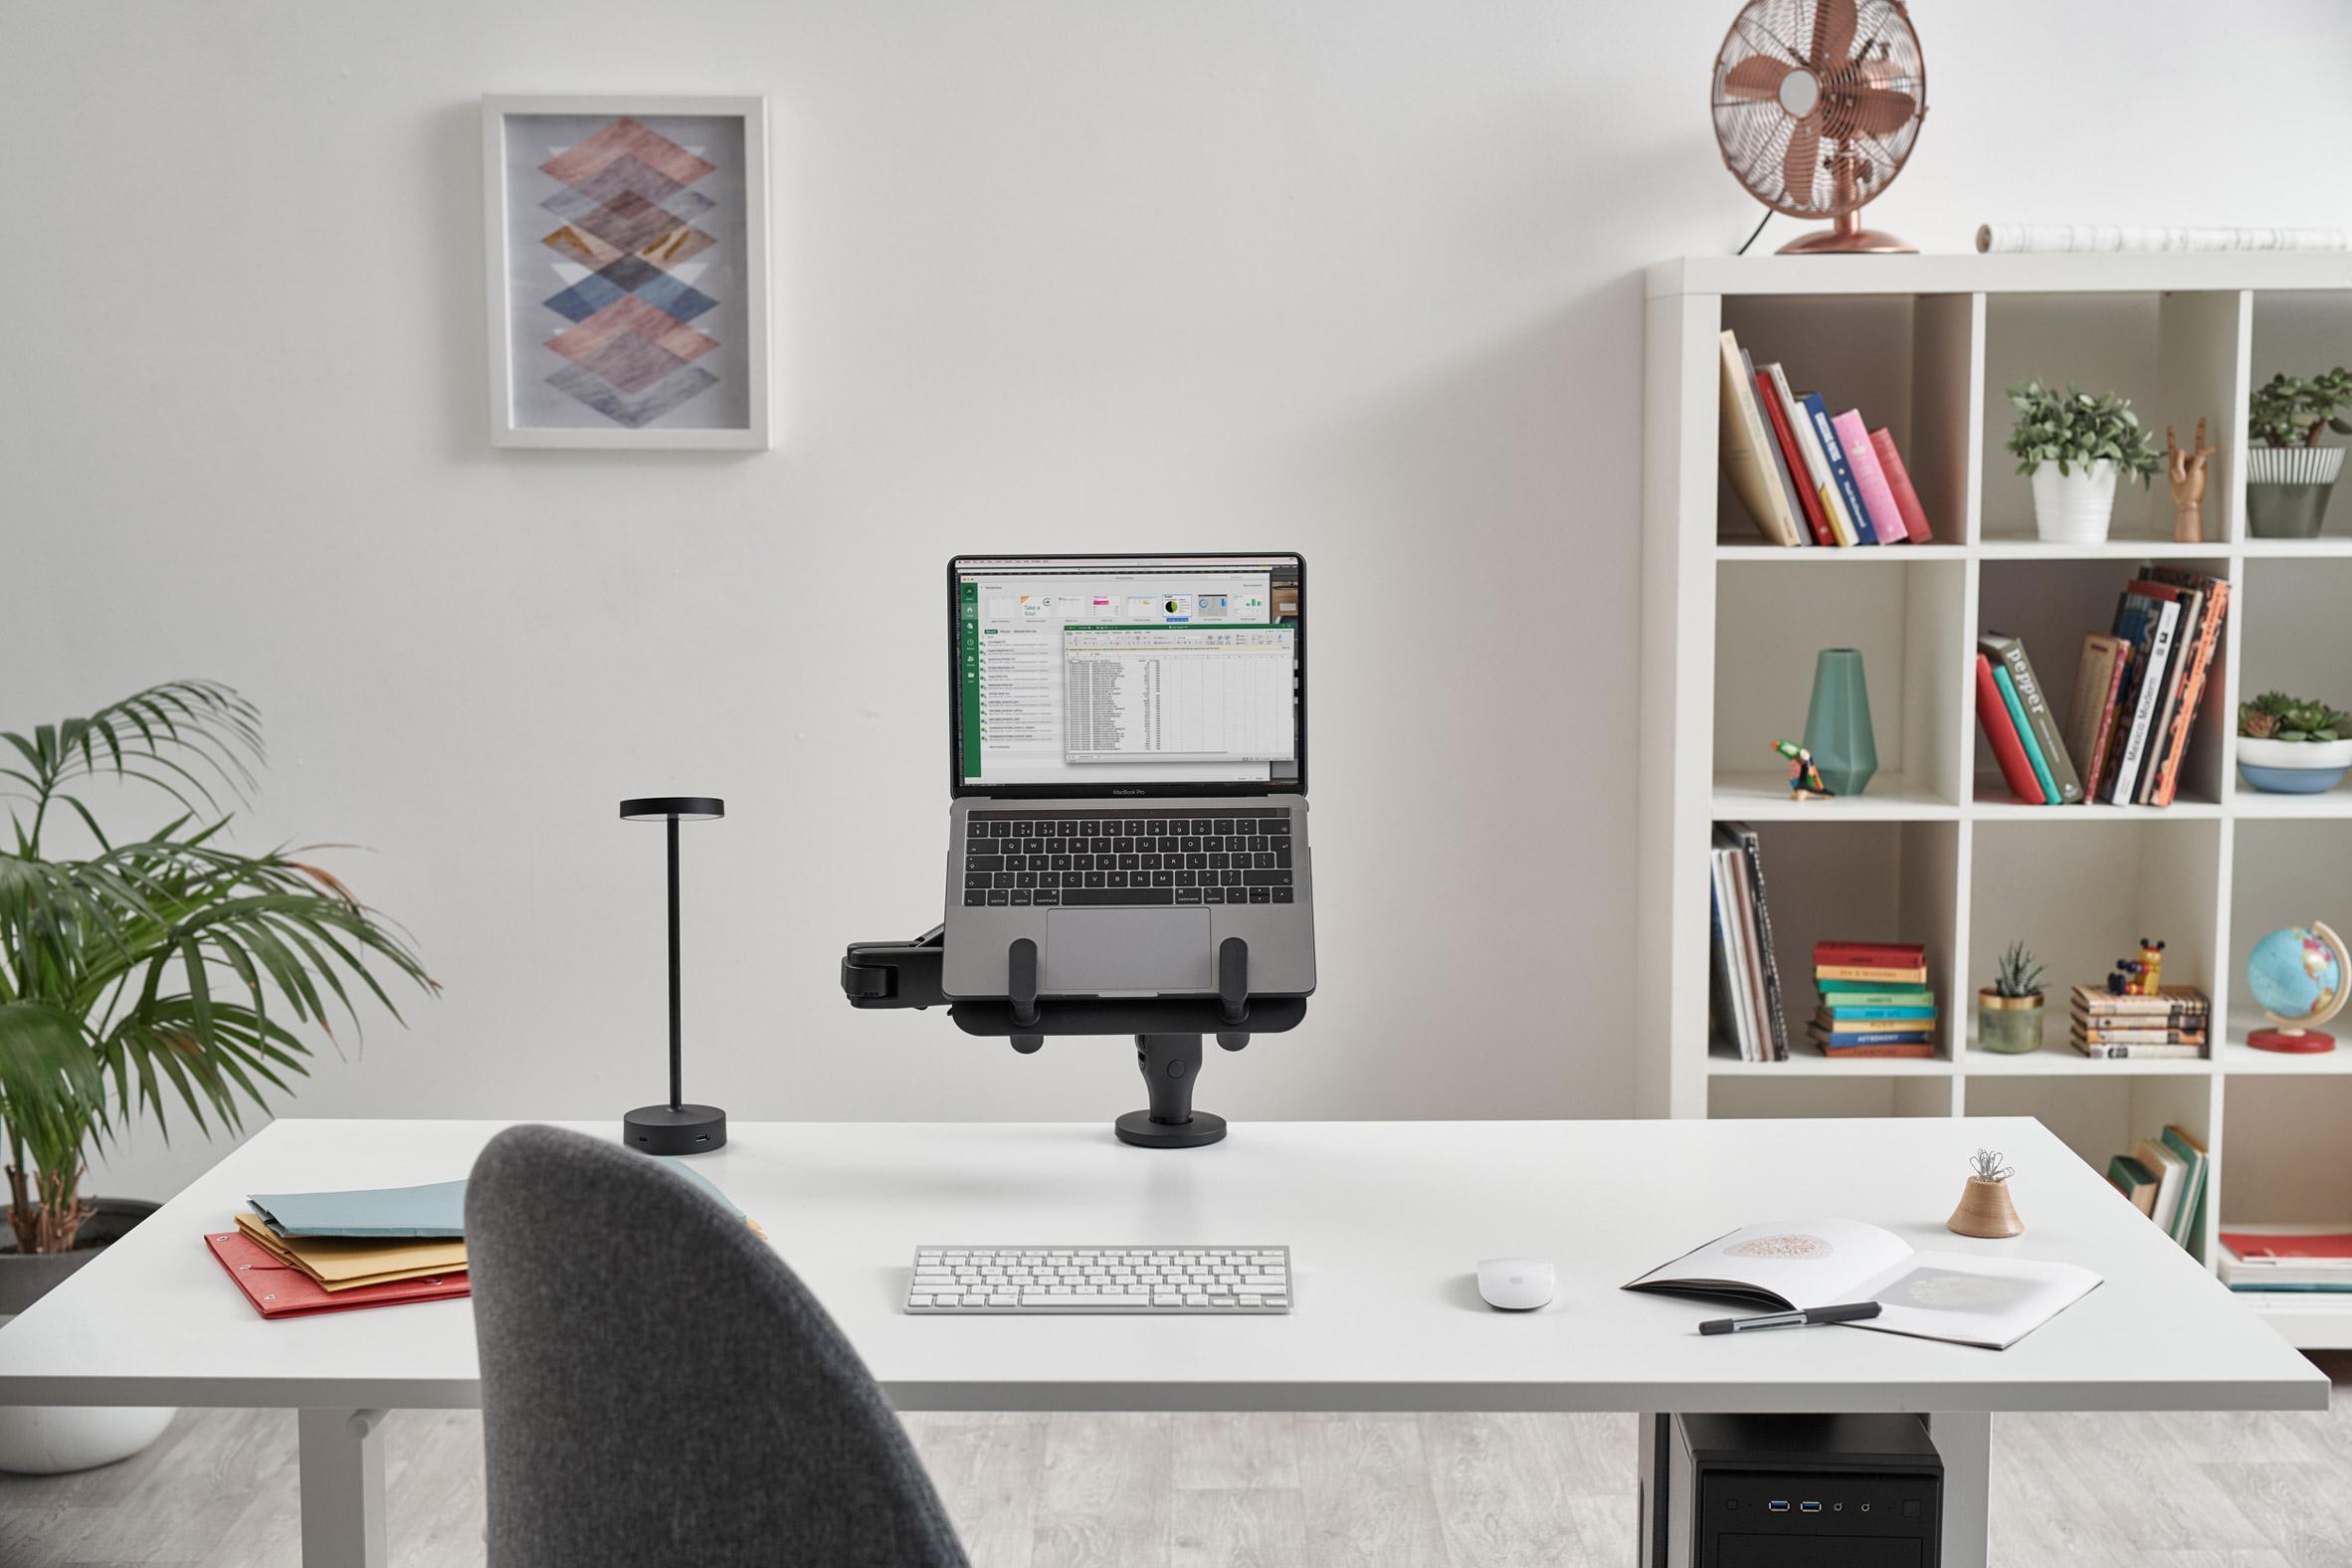 Black Lolly lamp on a desk